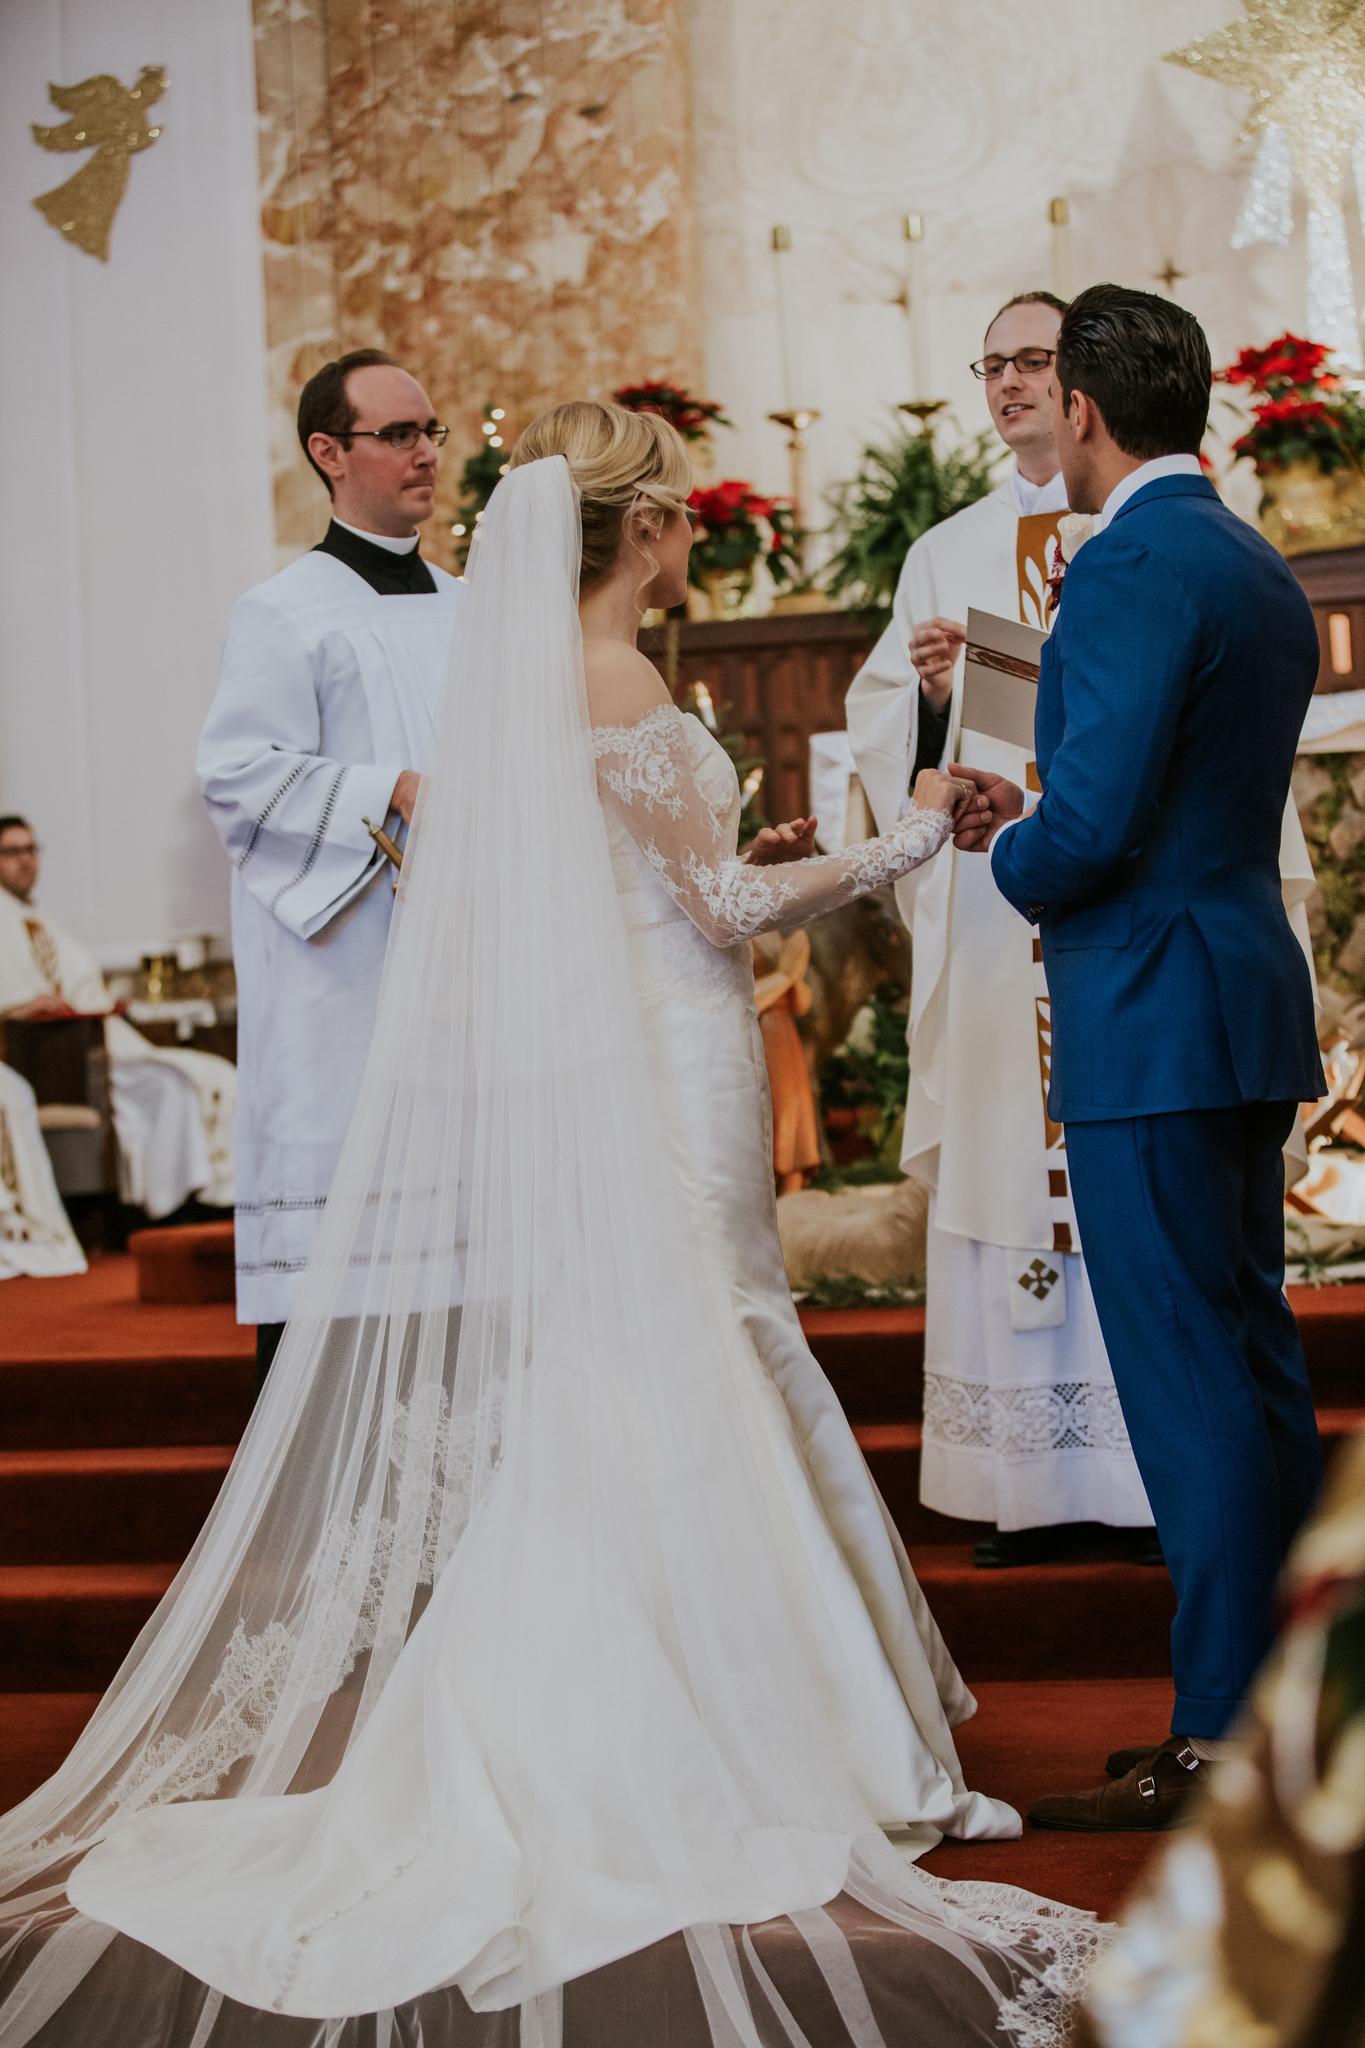 20151230_hussem_wedding_0473_web.jpg